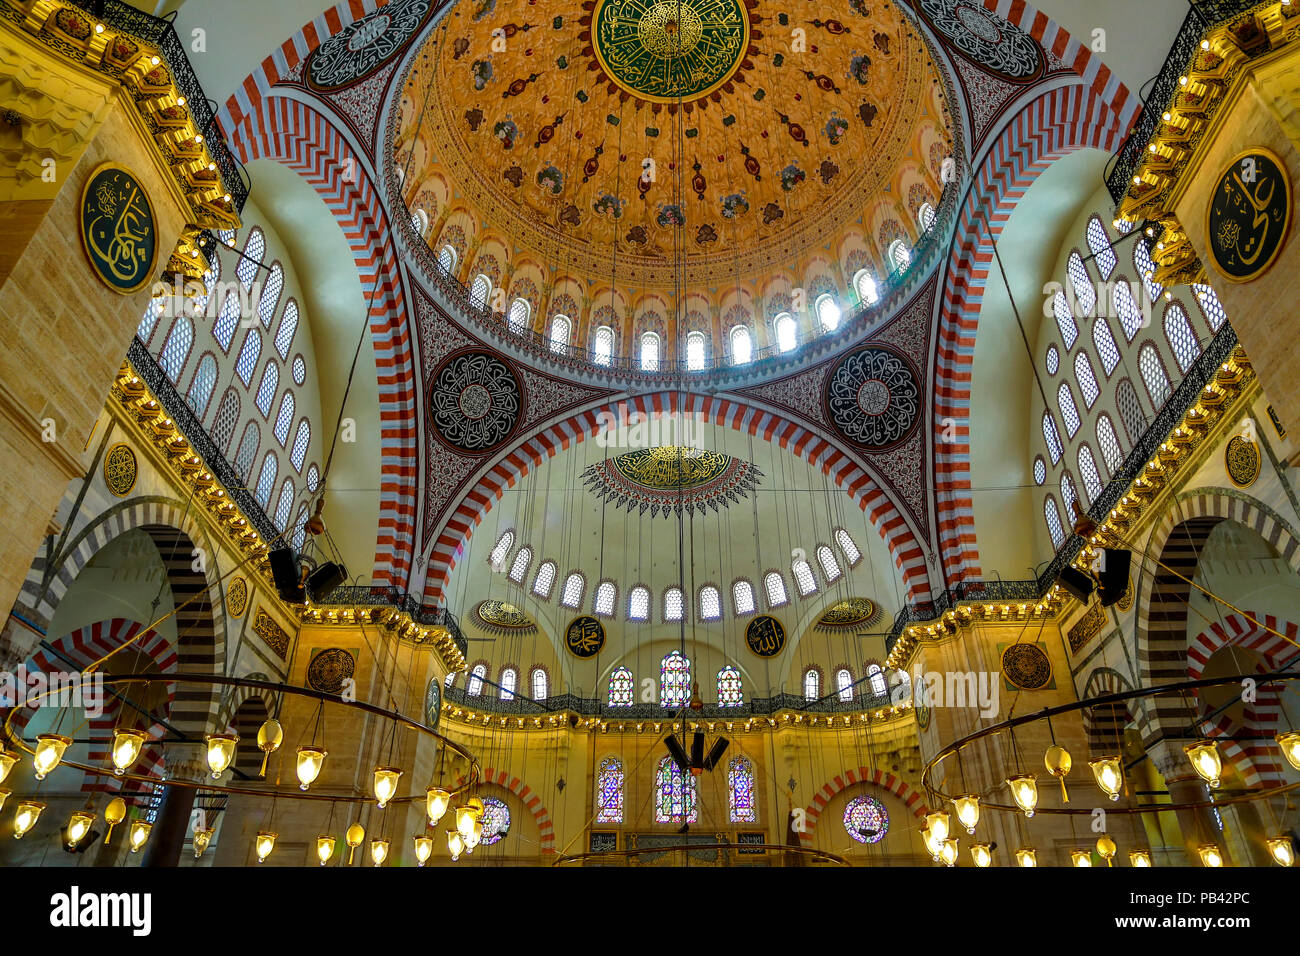 Ceiling of prayer hall, Suleymaniye Mosque, Istanbul, Turkey - Stock Image